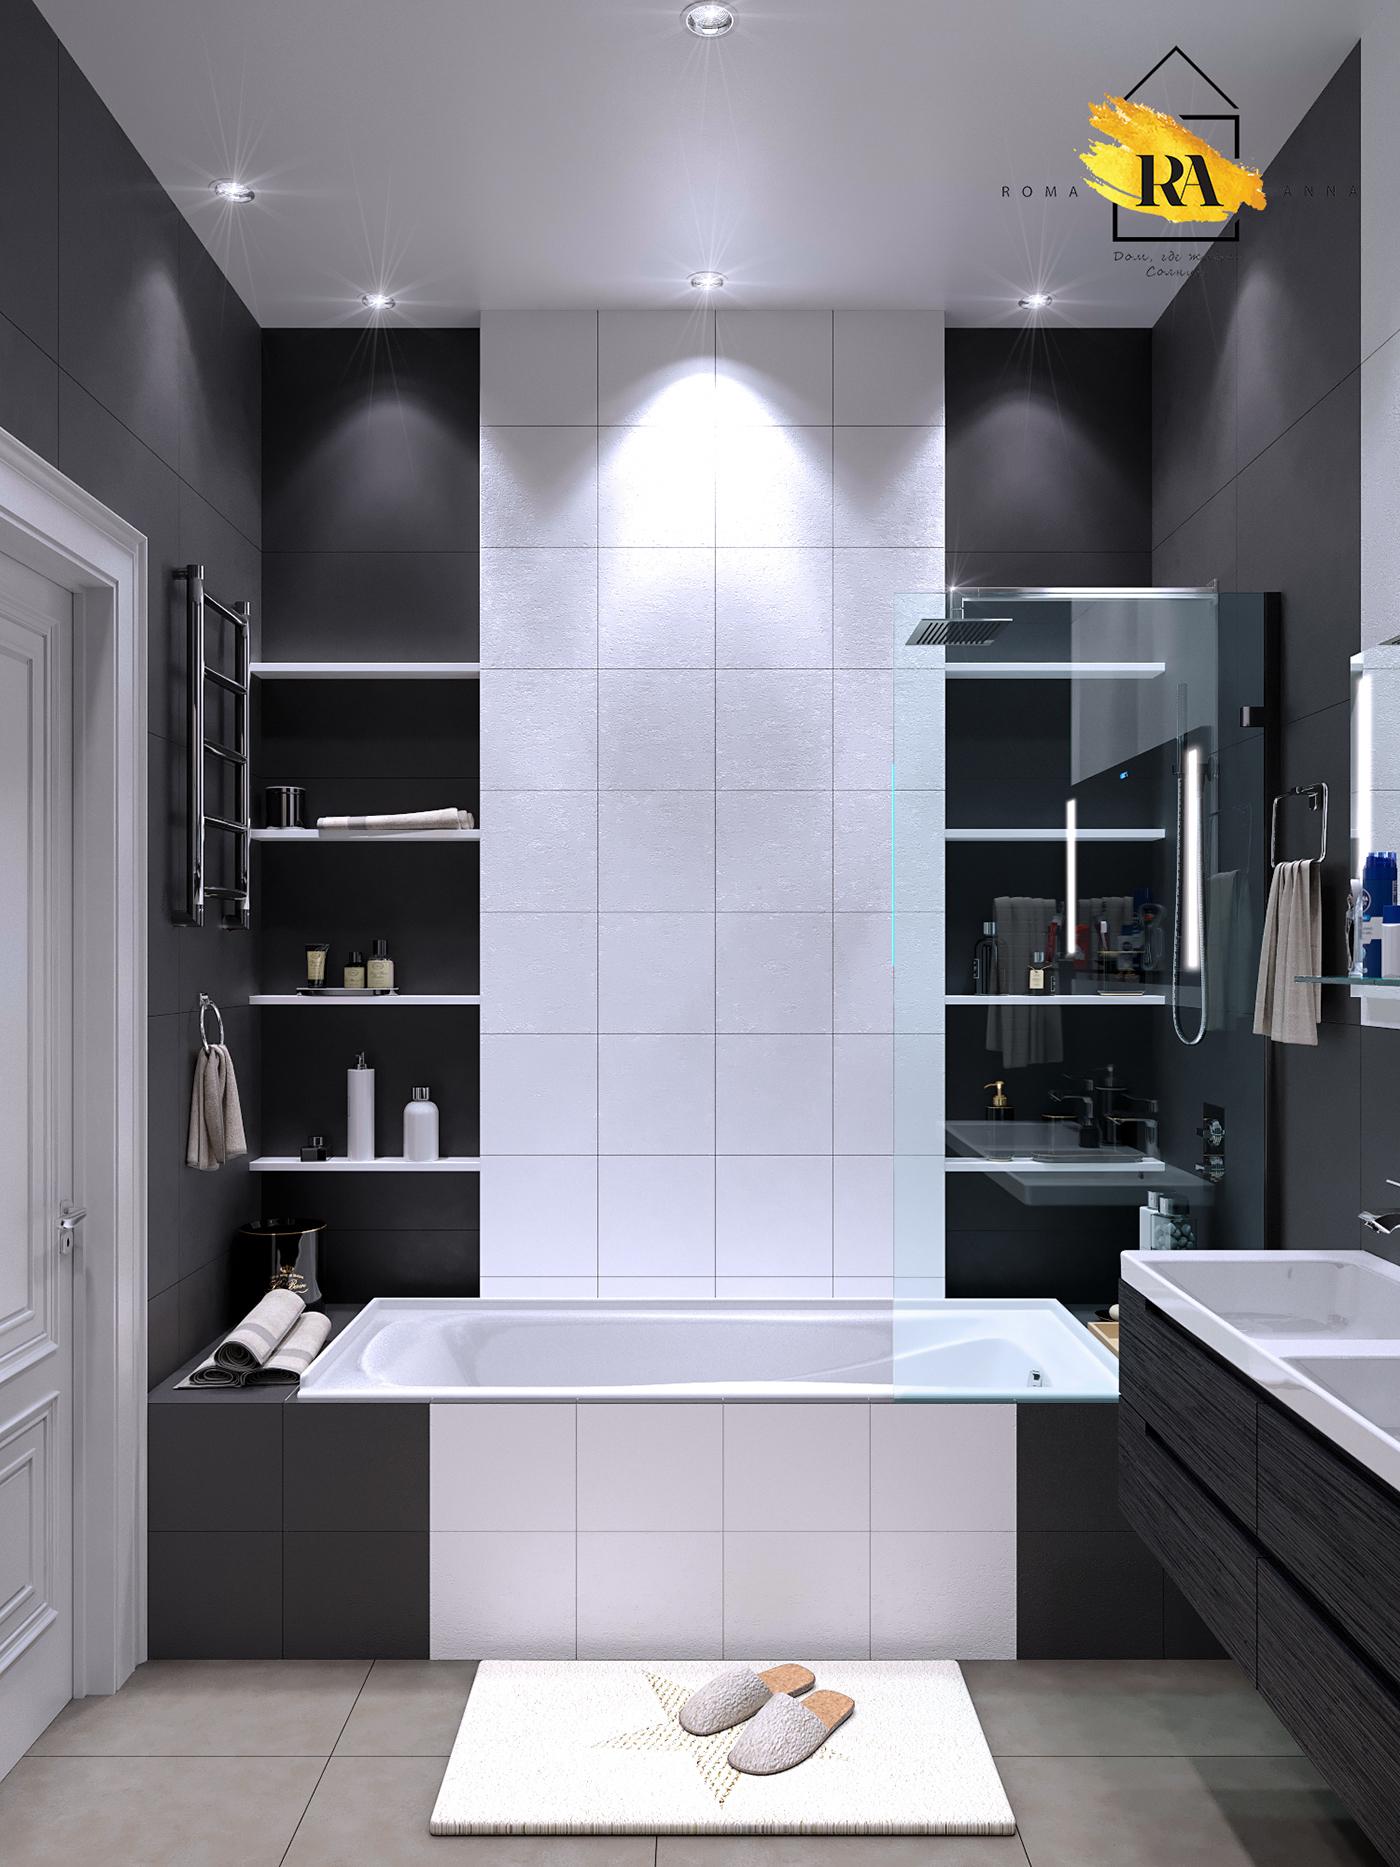 Bathroom visualization in 3d max corona render image